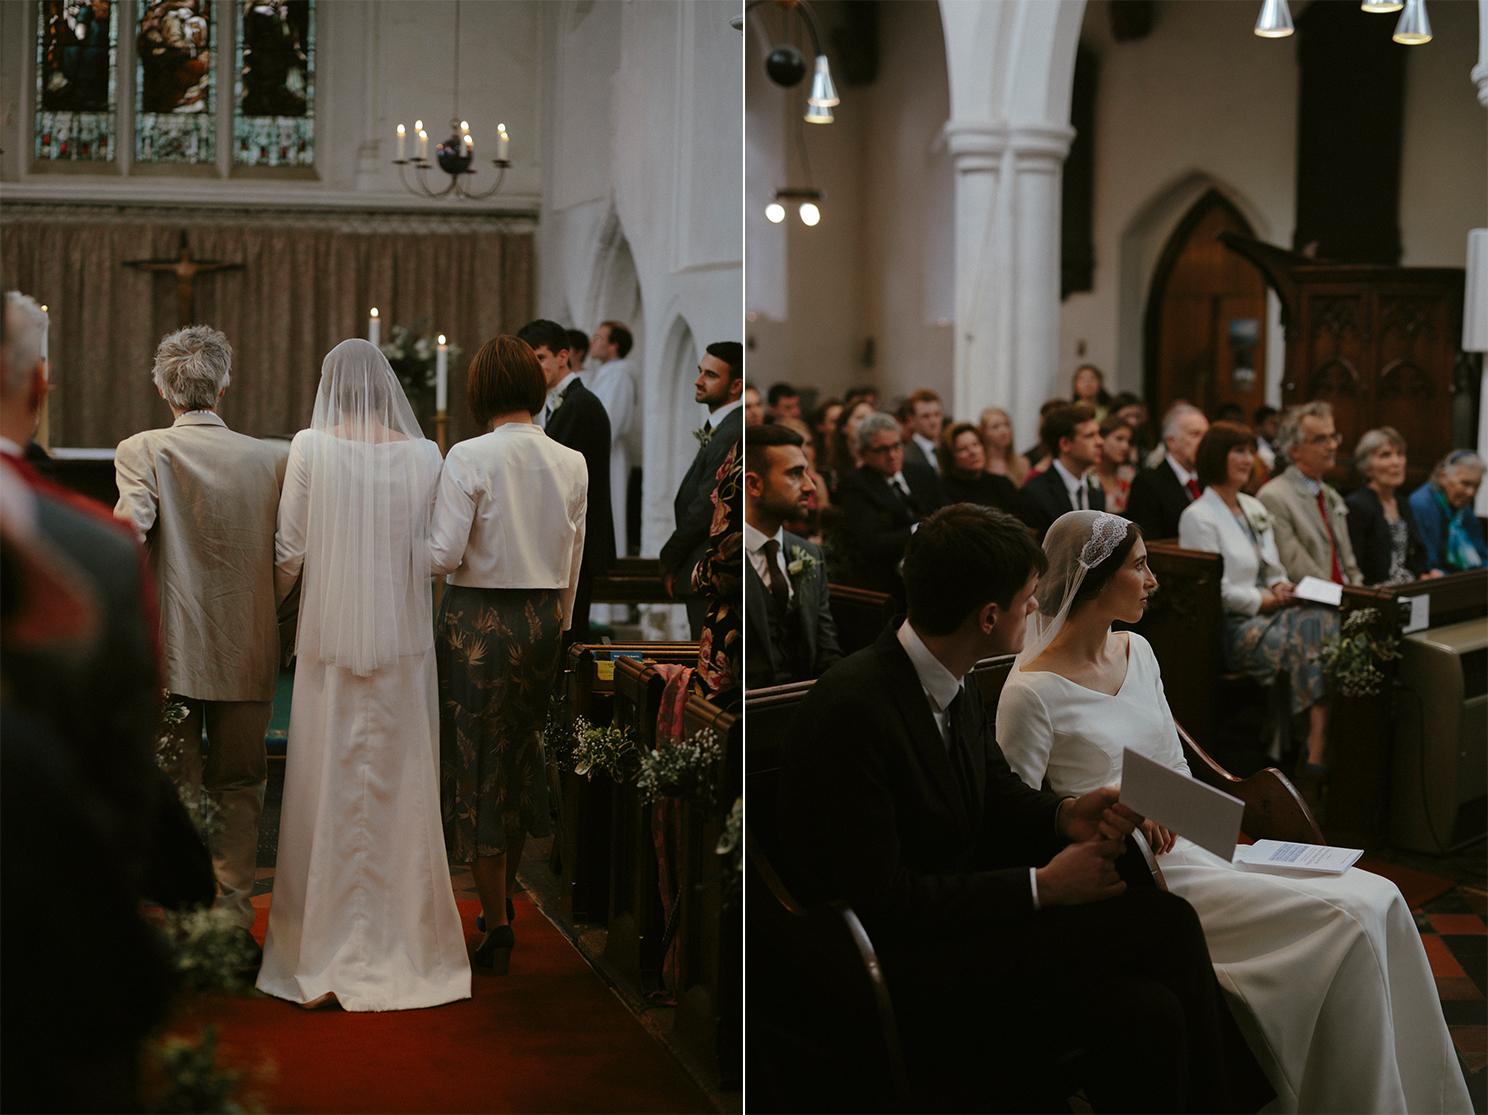 st-bene't's-cambridge-wedding.jpg